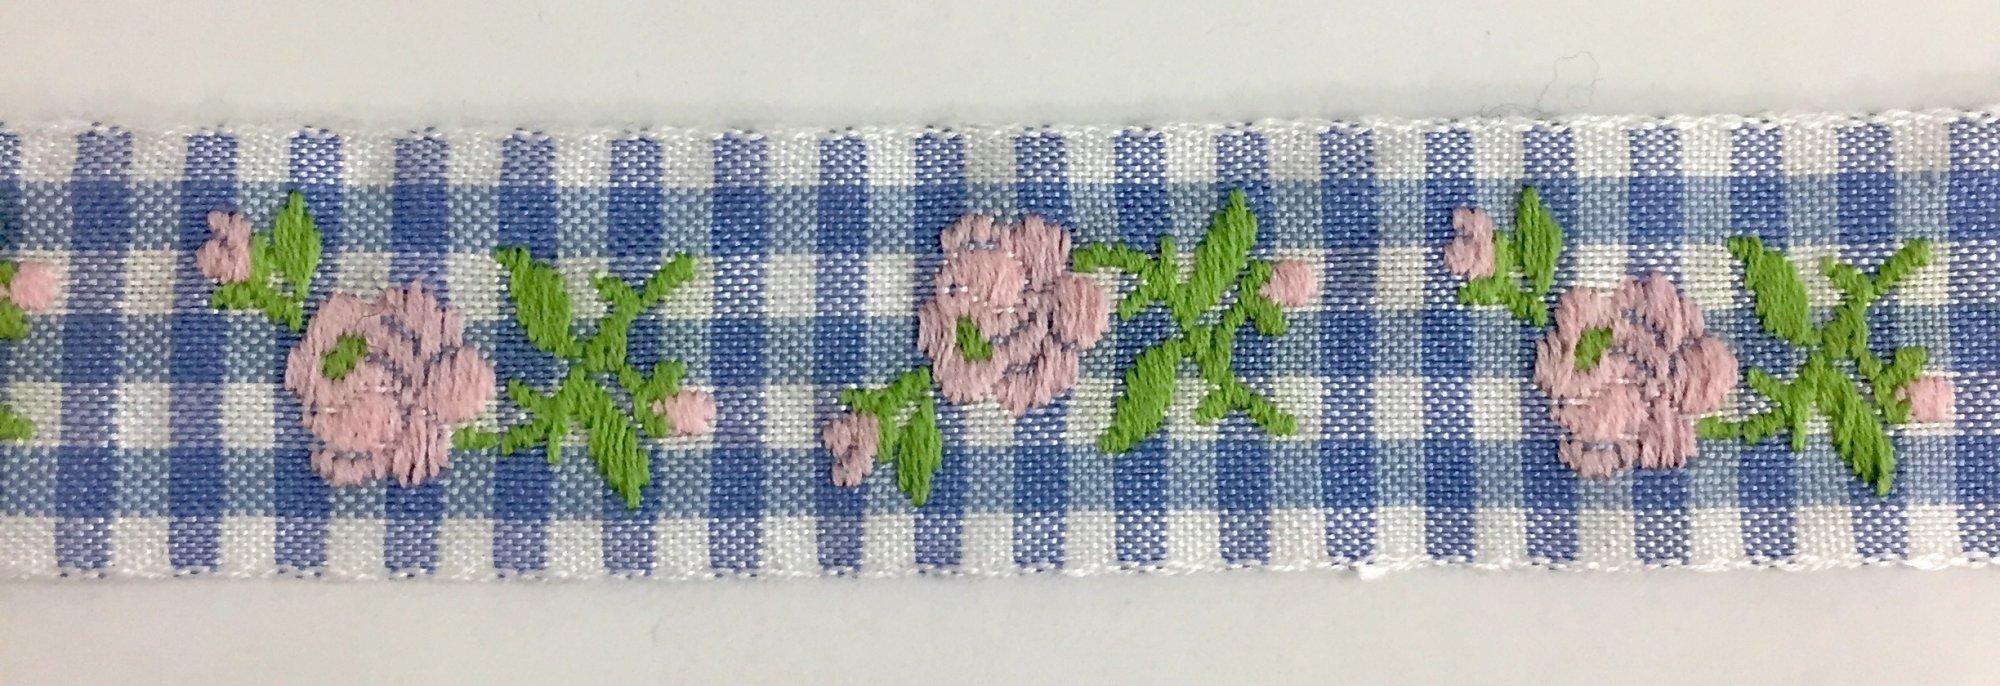 7/8 inch- Blue Gingham Pink Flower